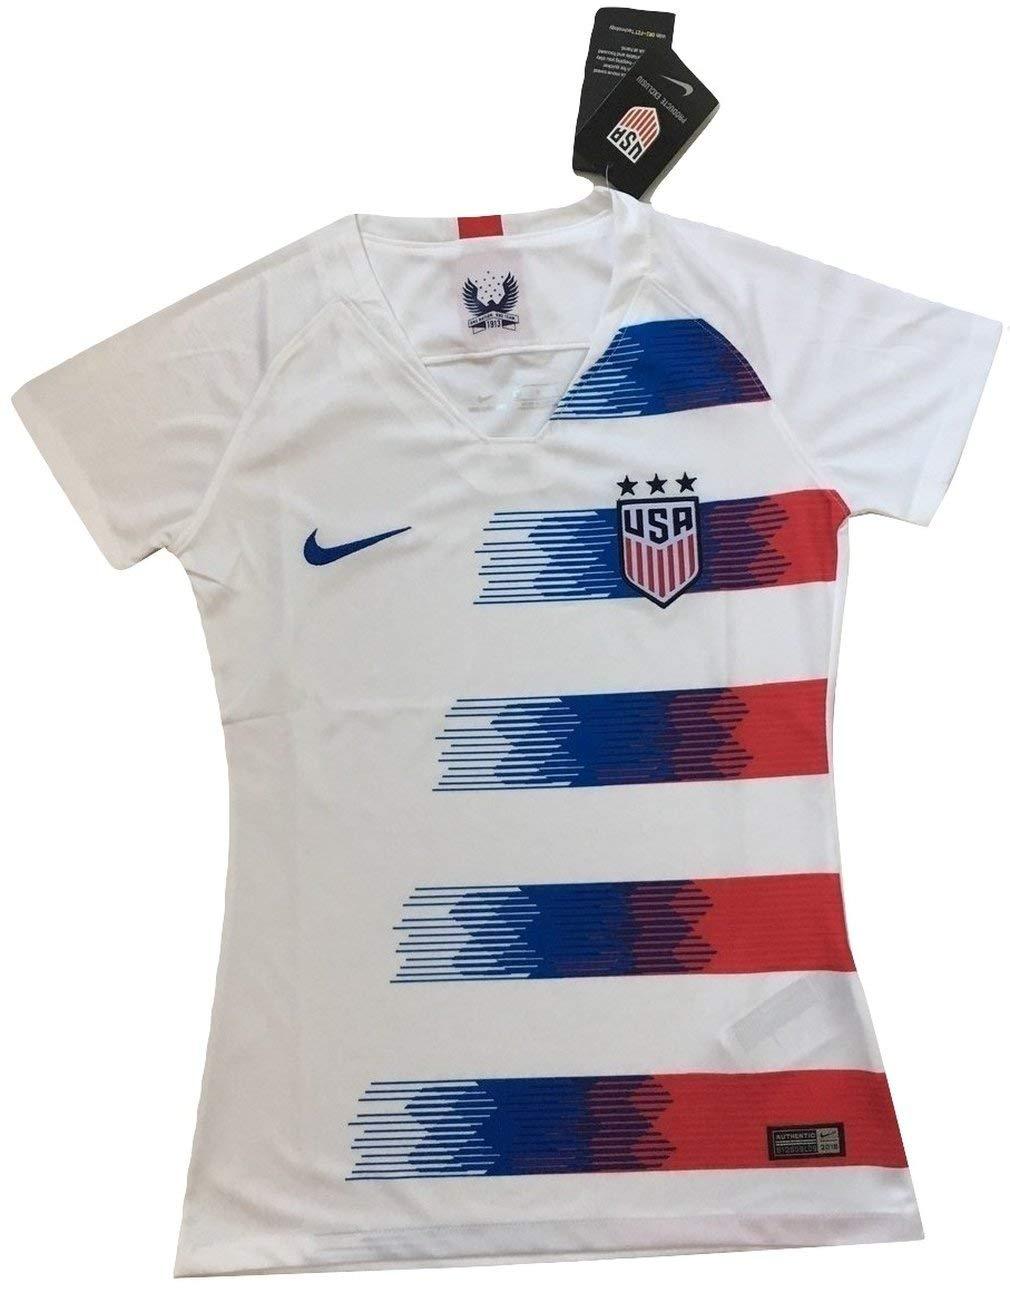 be89c1938 Get Quotations · Mallnkakova Women s USA National Team 2018-2019 Home Soccer  Jersey White